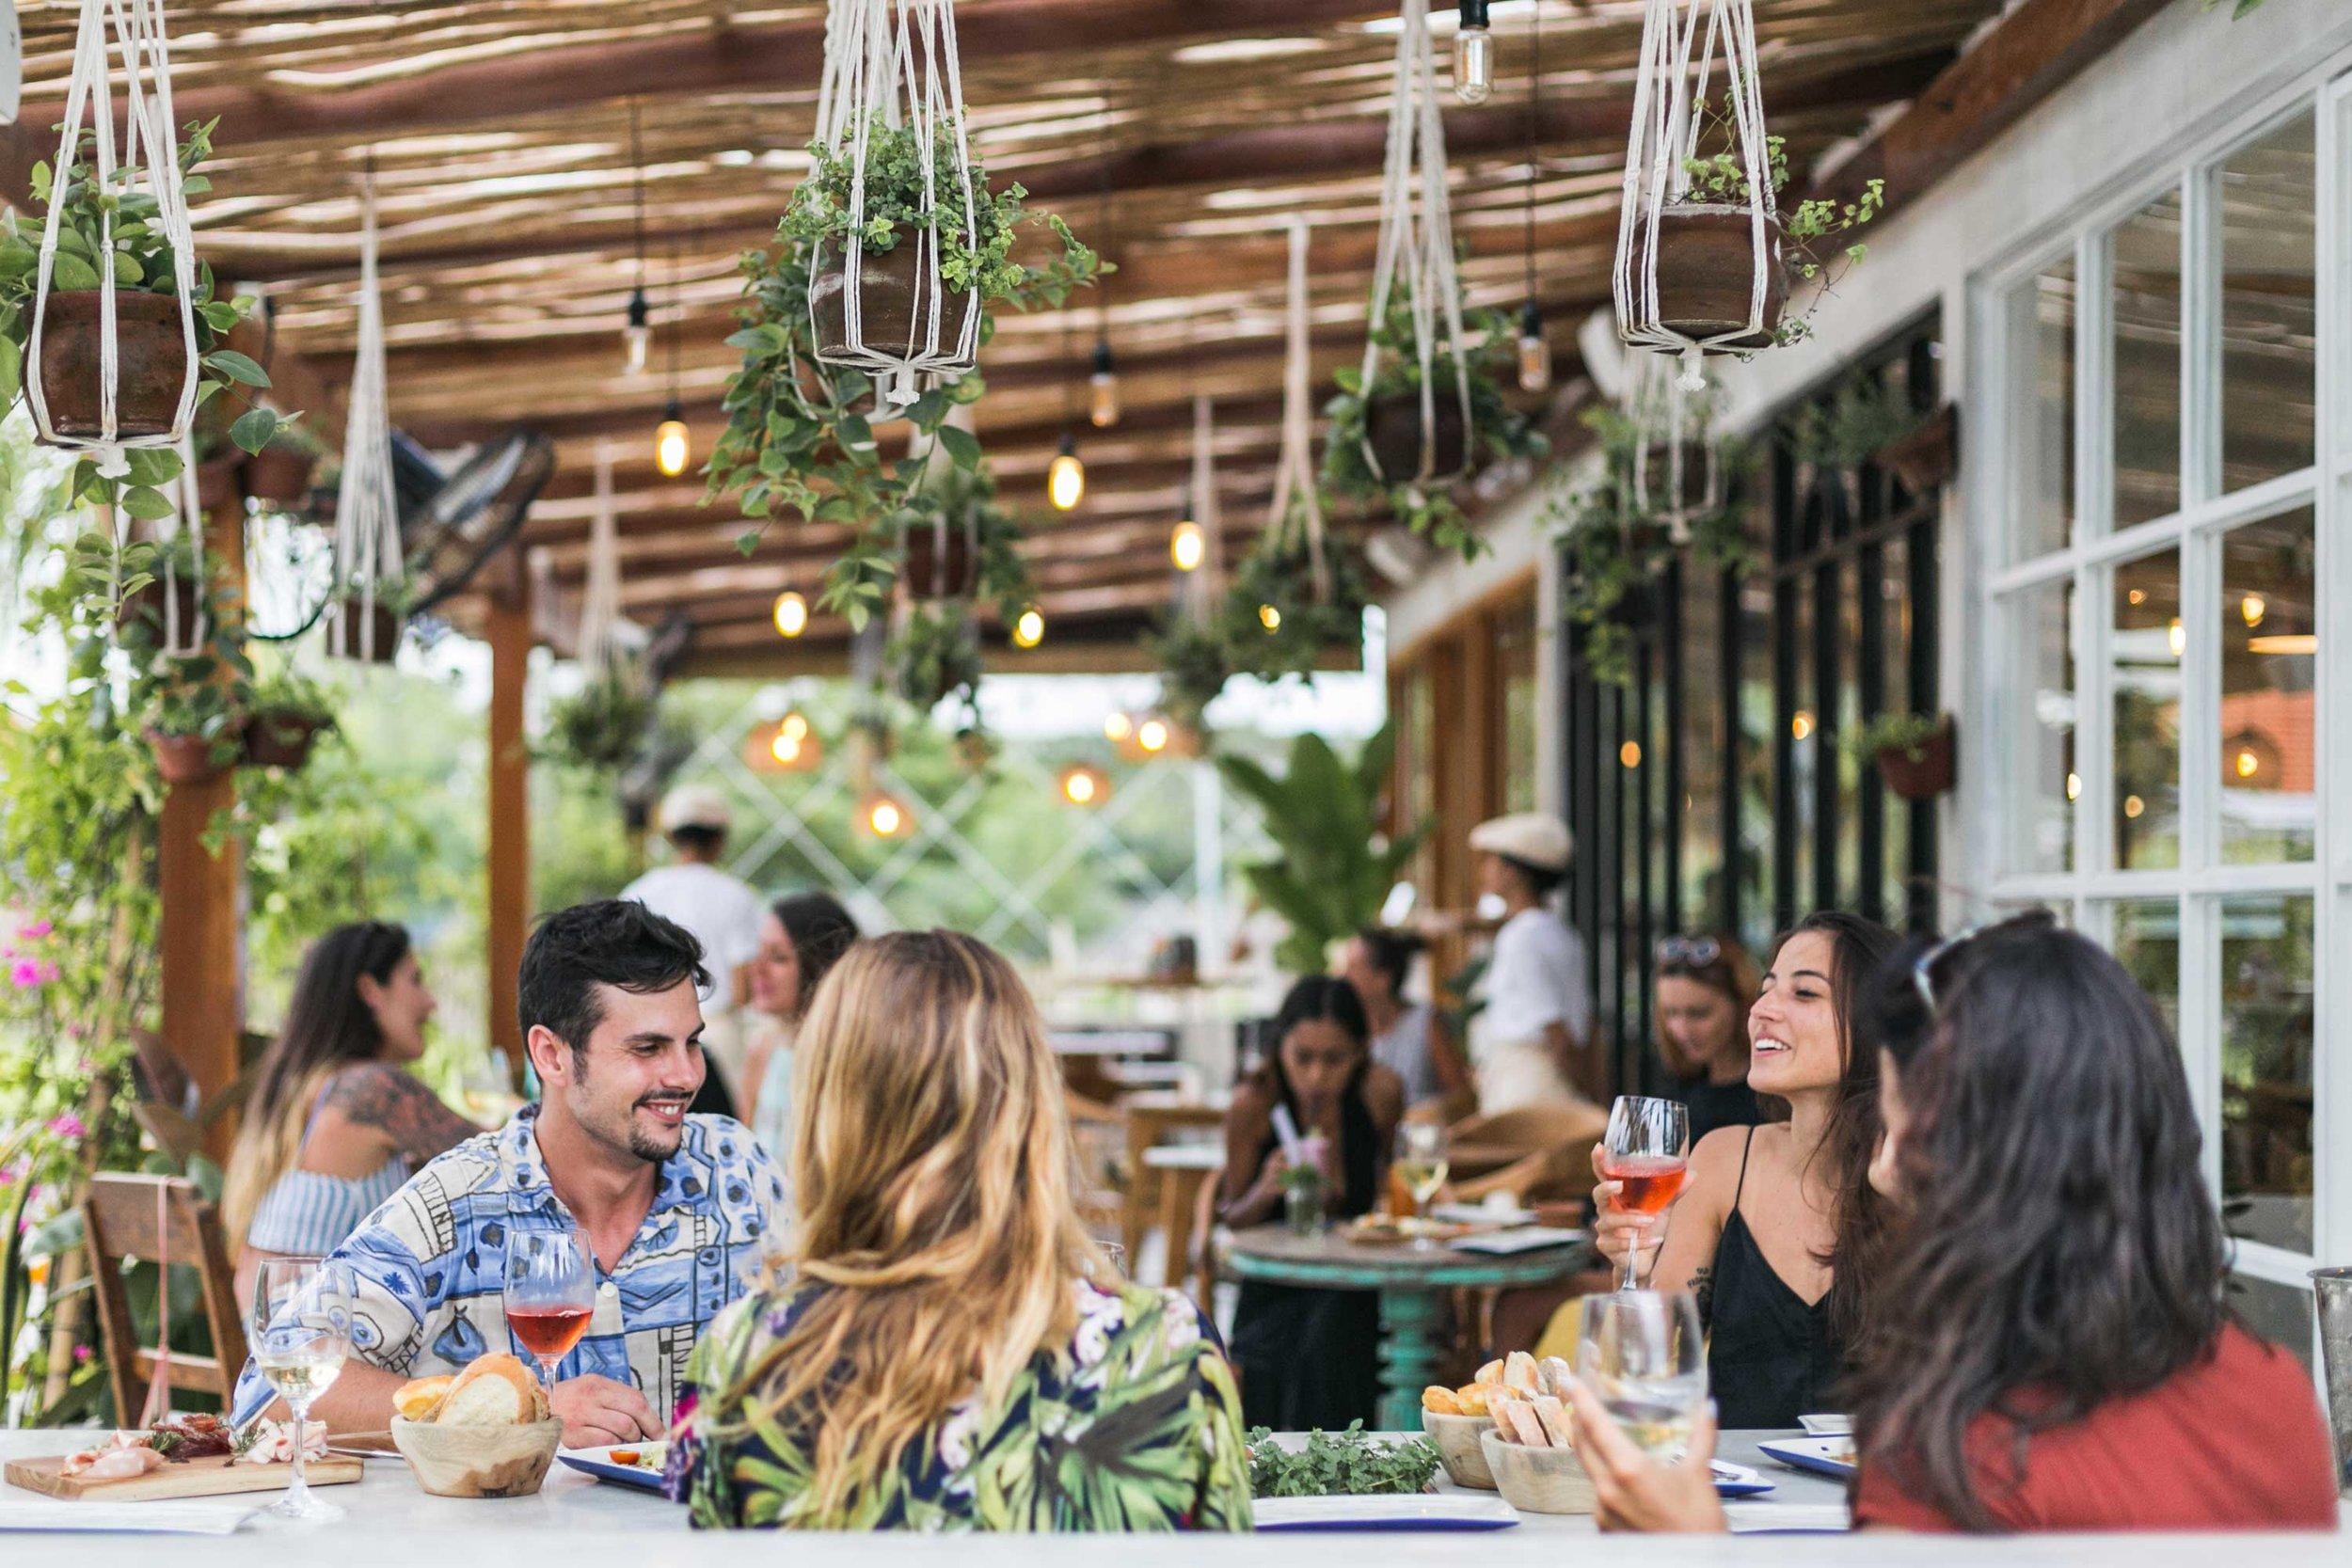 jetstar-april-2019-eat-drink-bottega-italiana-berawa-canggu-bali.jpg